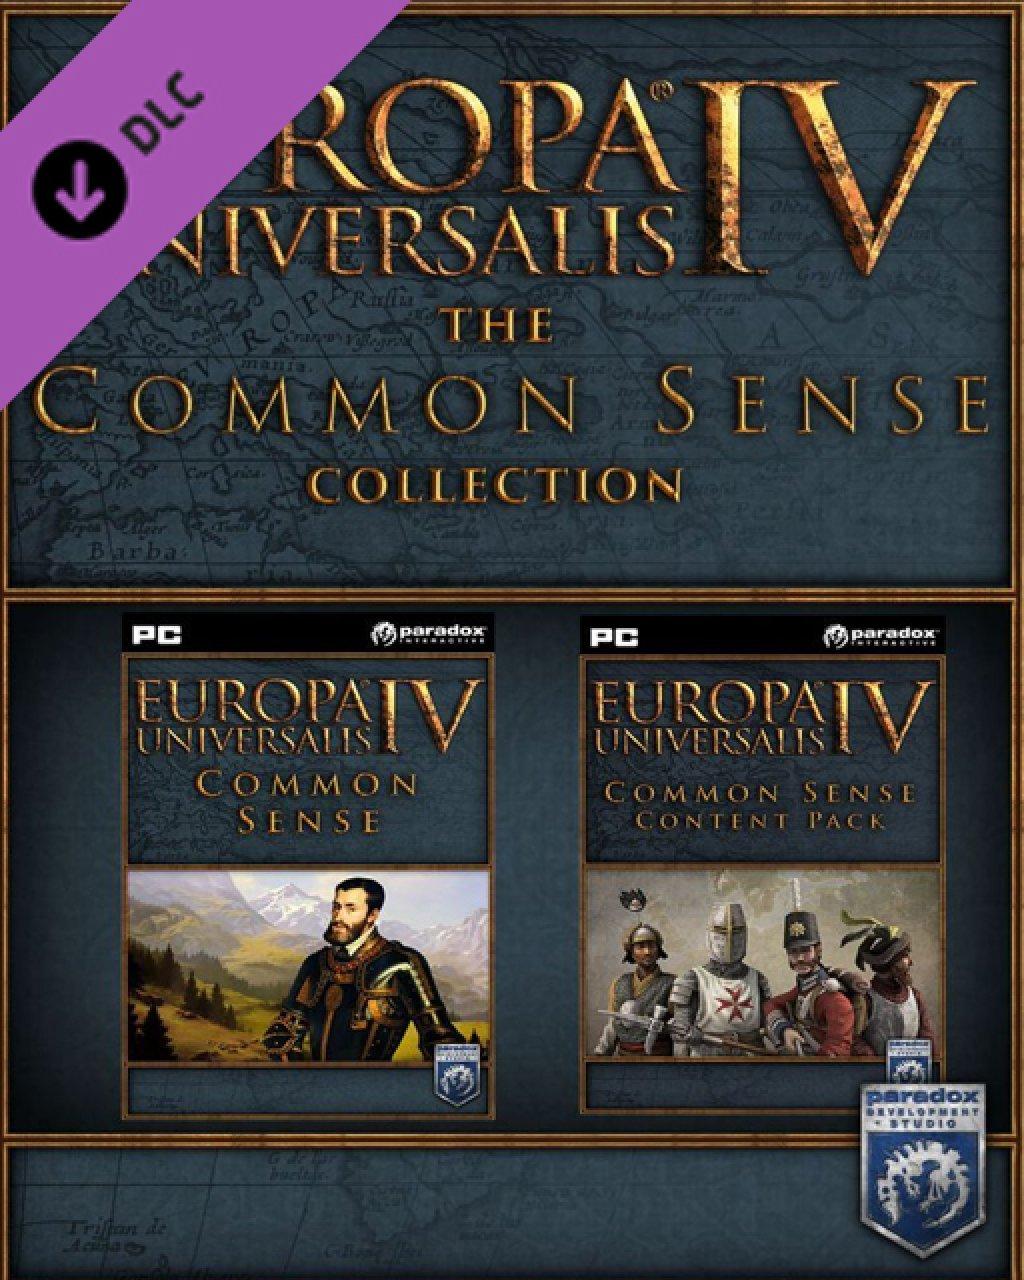 Europa Universalis IV Common Sense Collection